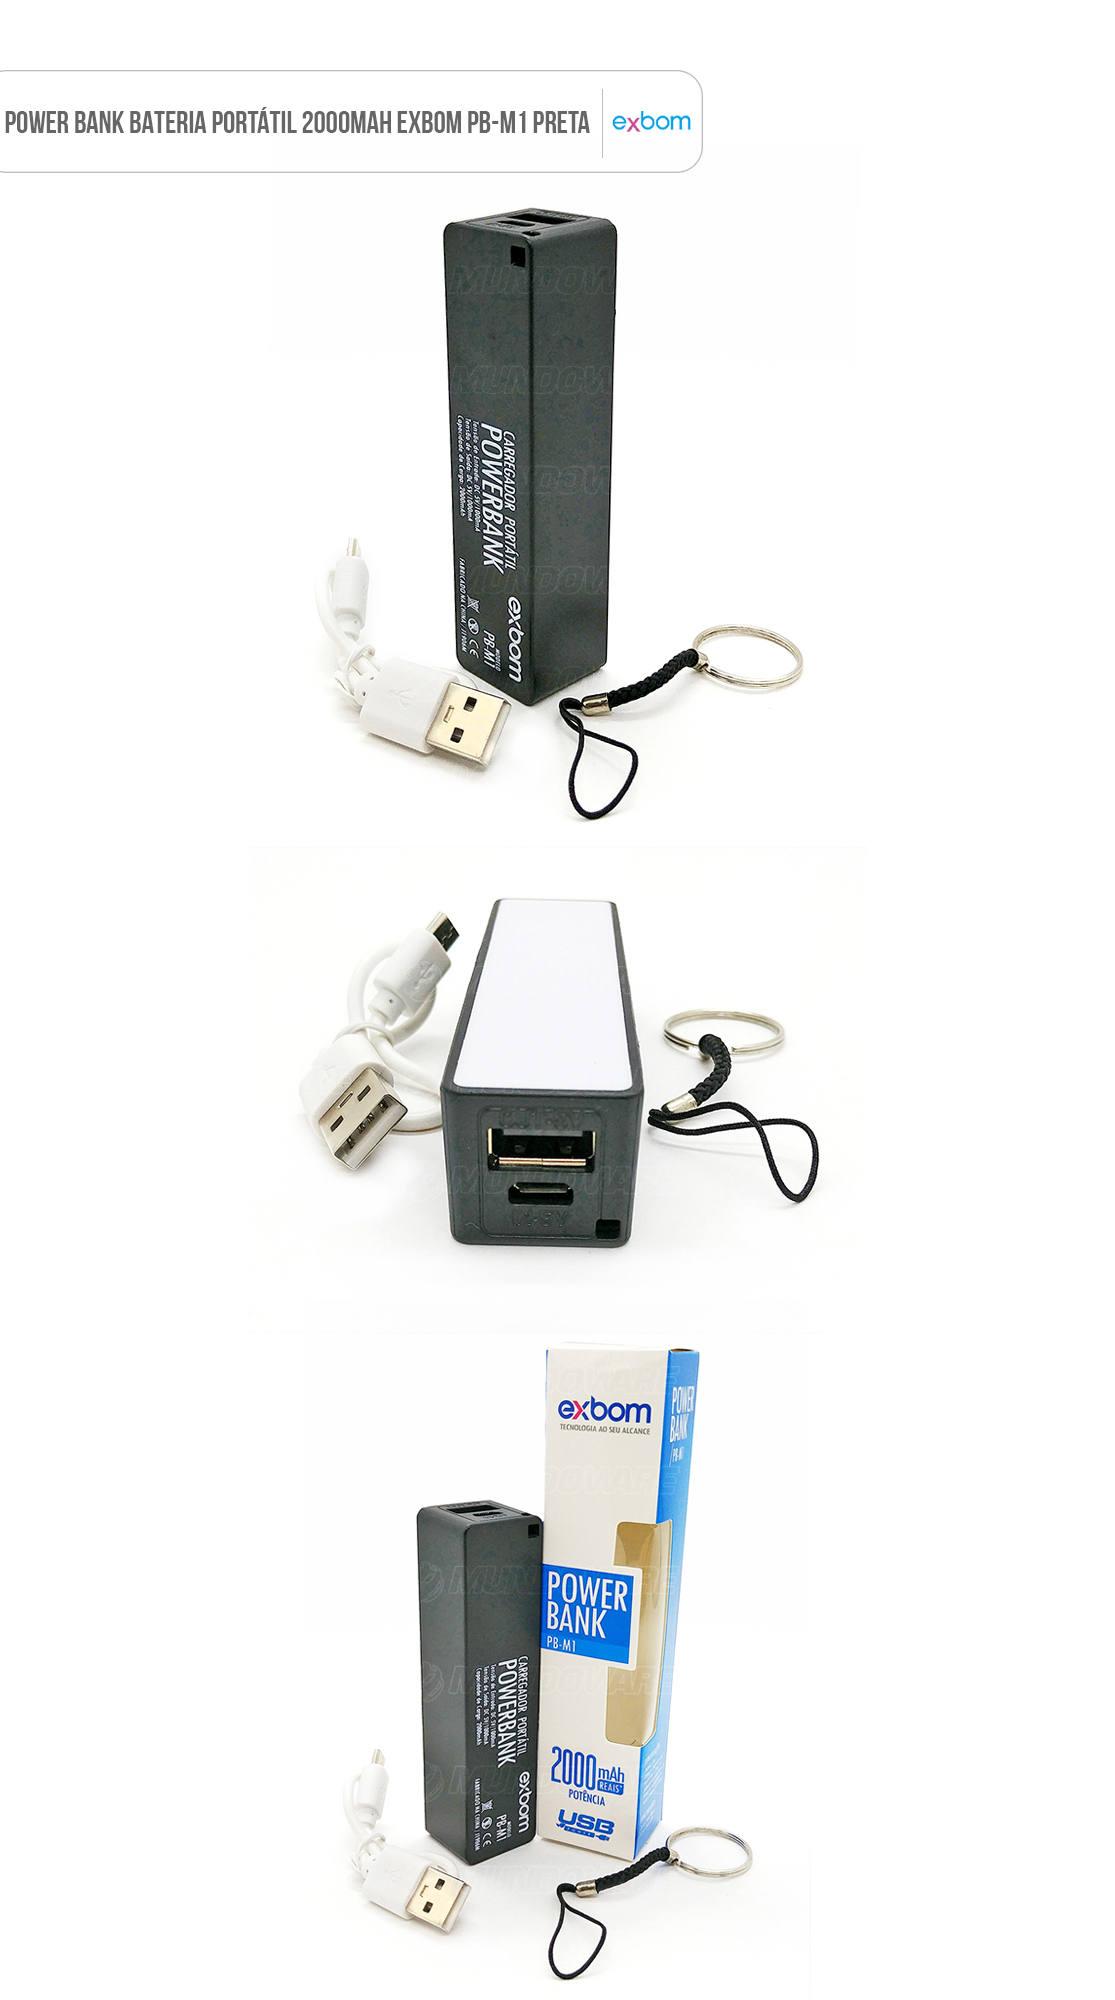 Power Bank Bateria Portátil 2000mAh Preta Exbom PB-M1